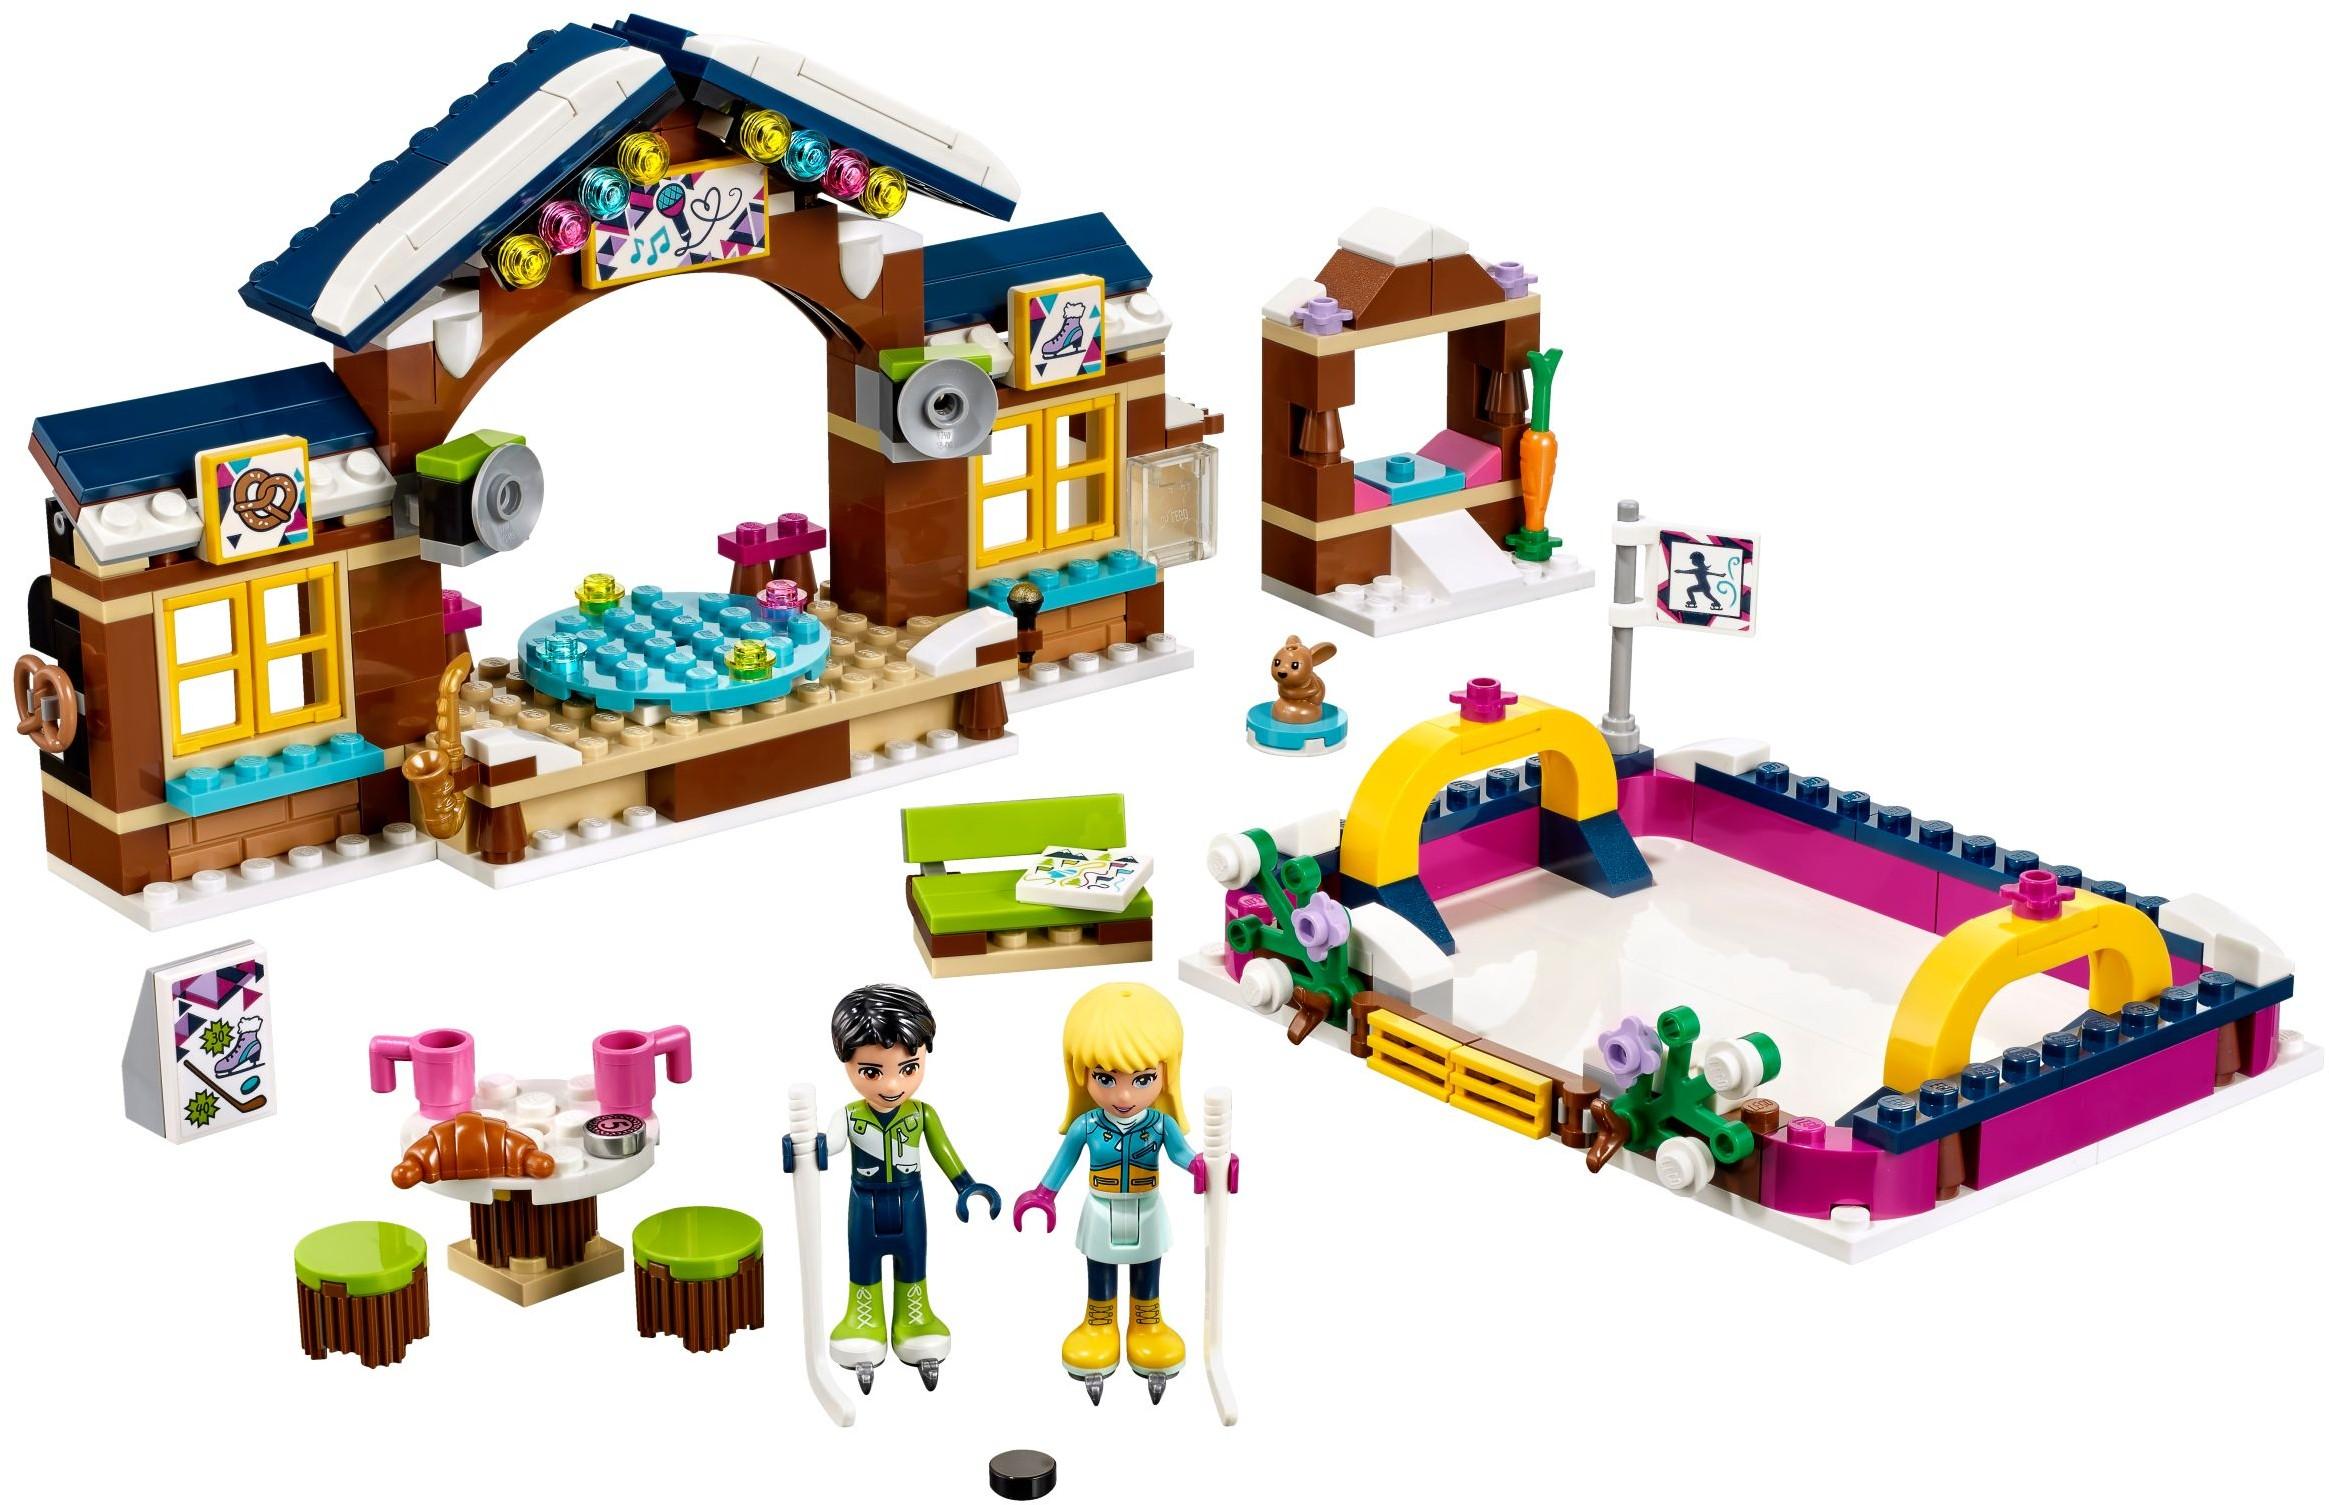 friends | snow resort | brickset: lego set guide and database